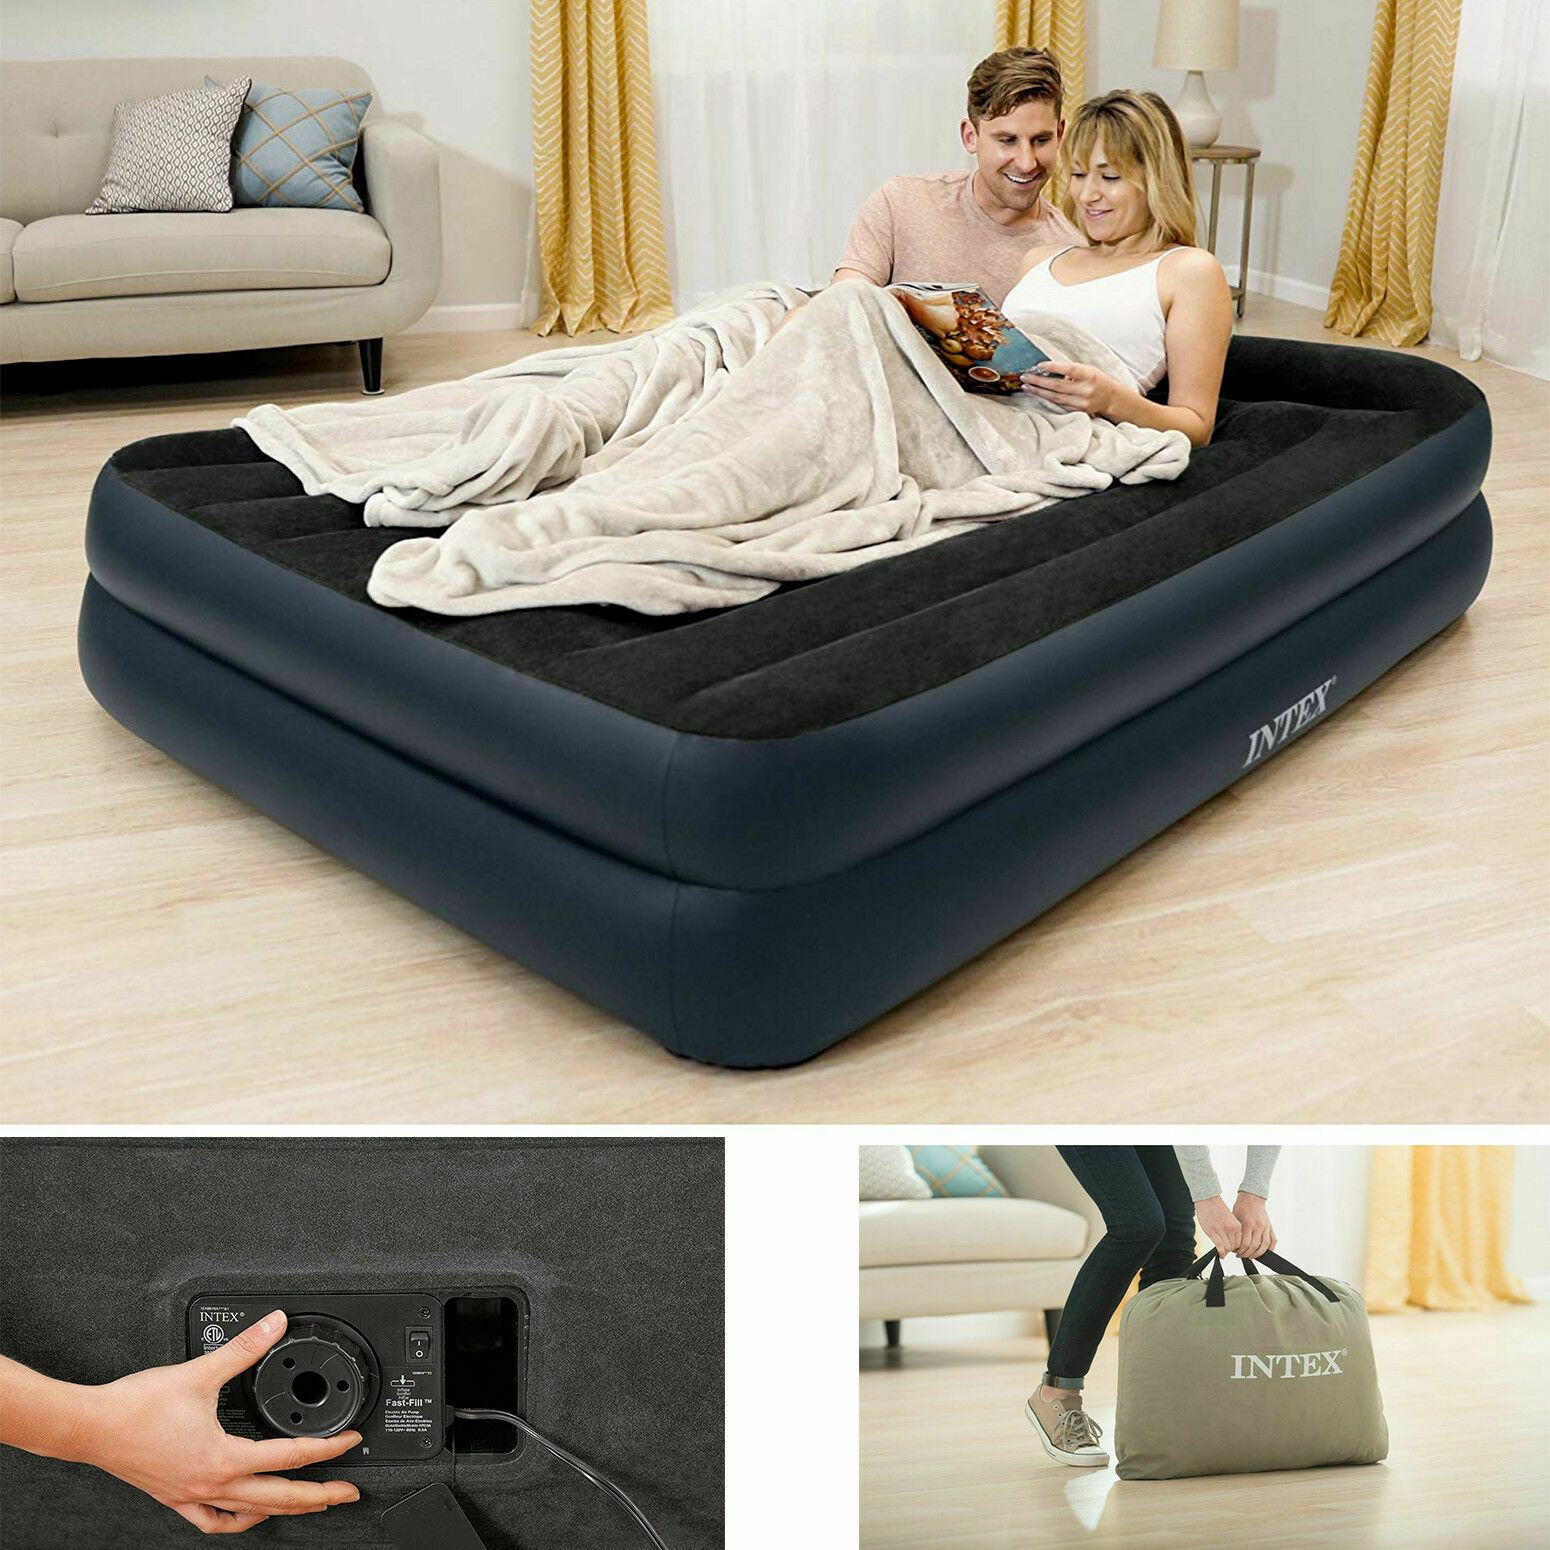 Intex 16-1/2 Inflatable Inch Dura-Beam Rising Comfort Fiber-